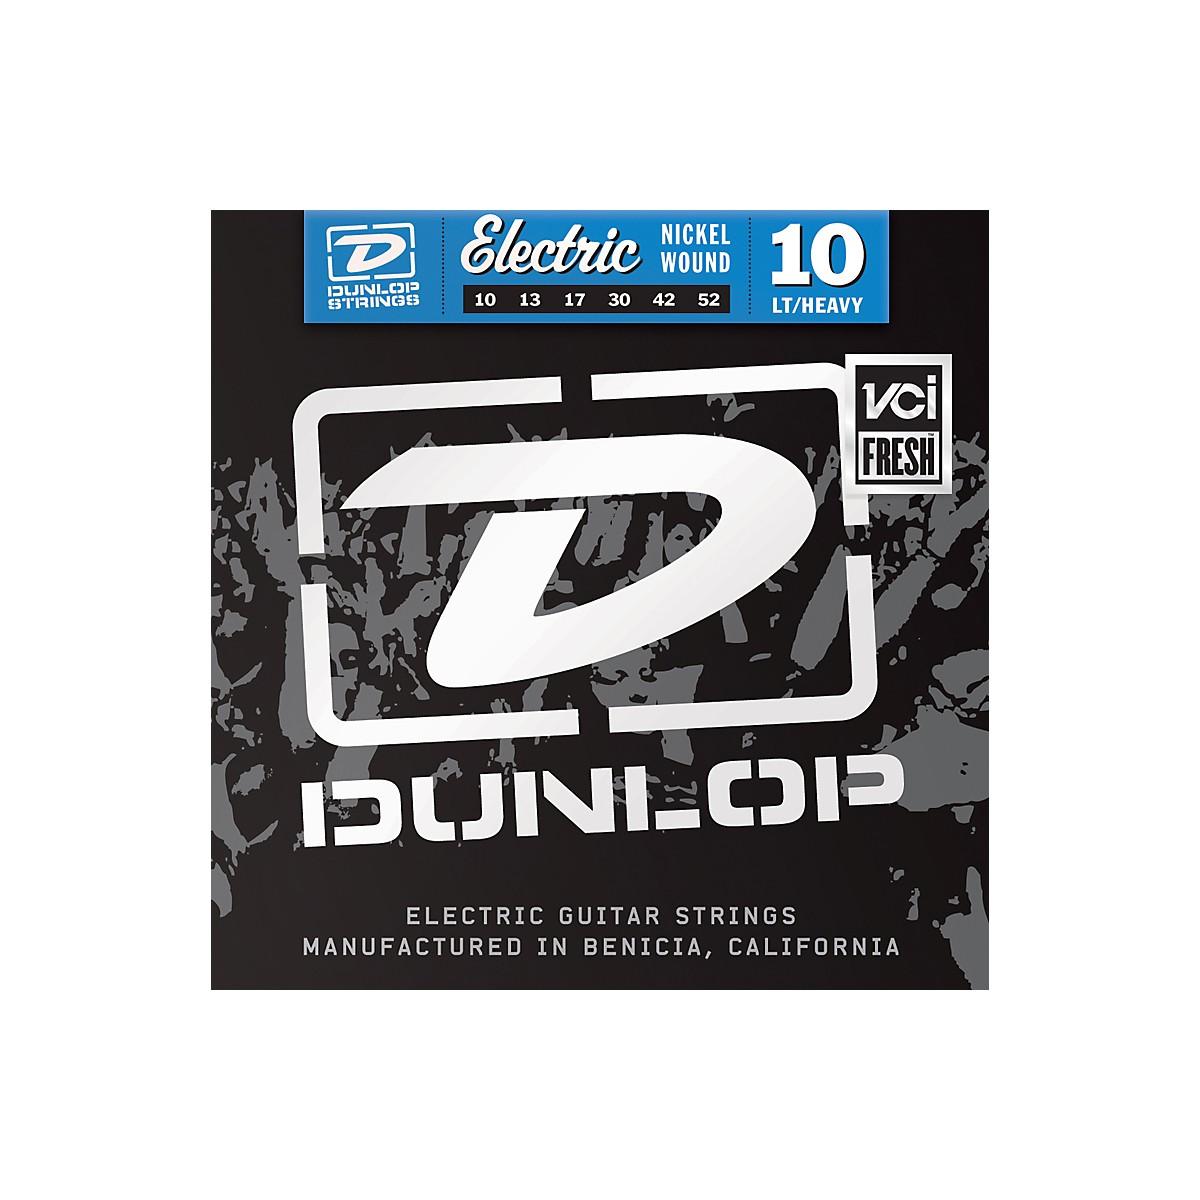 Dunlop Nickel Plated Steel Electric Guitar Strings - Light Top Heavy Bottom 10's